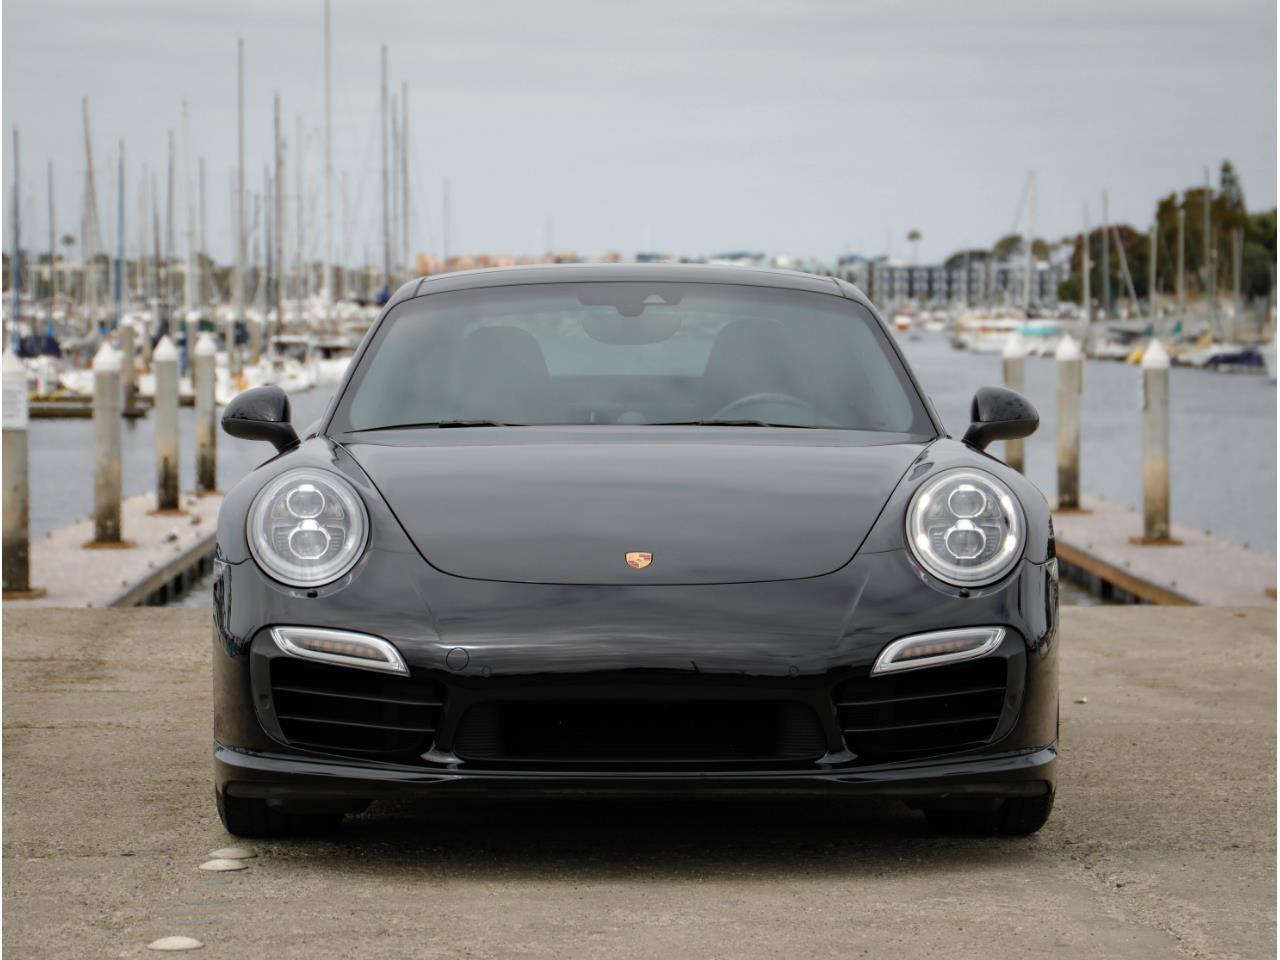 Large Picture of '14 Porsche 911 located in Marina Del Rey California - Q6GN